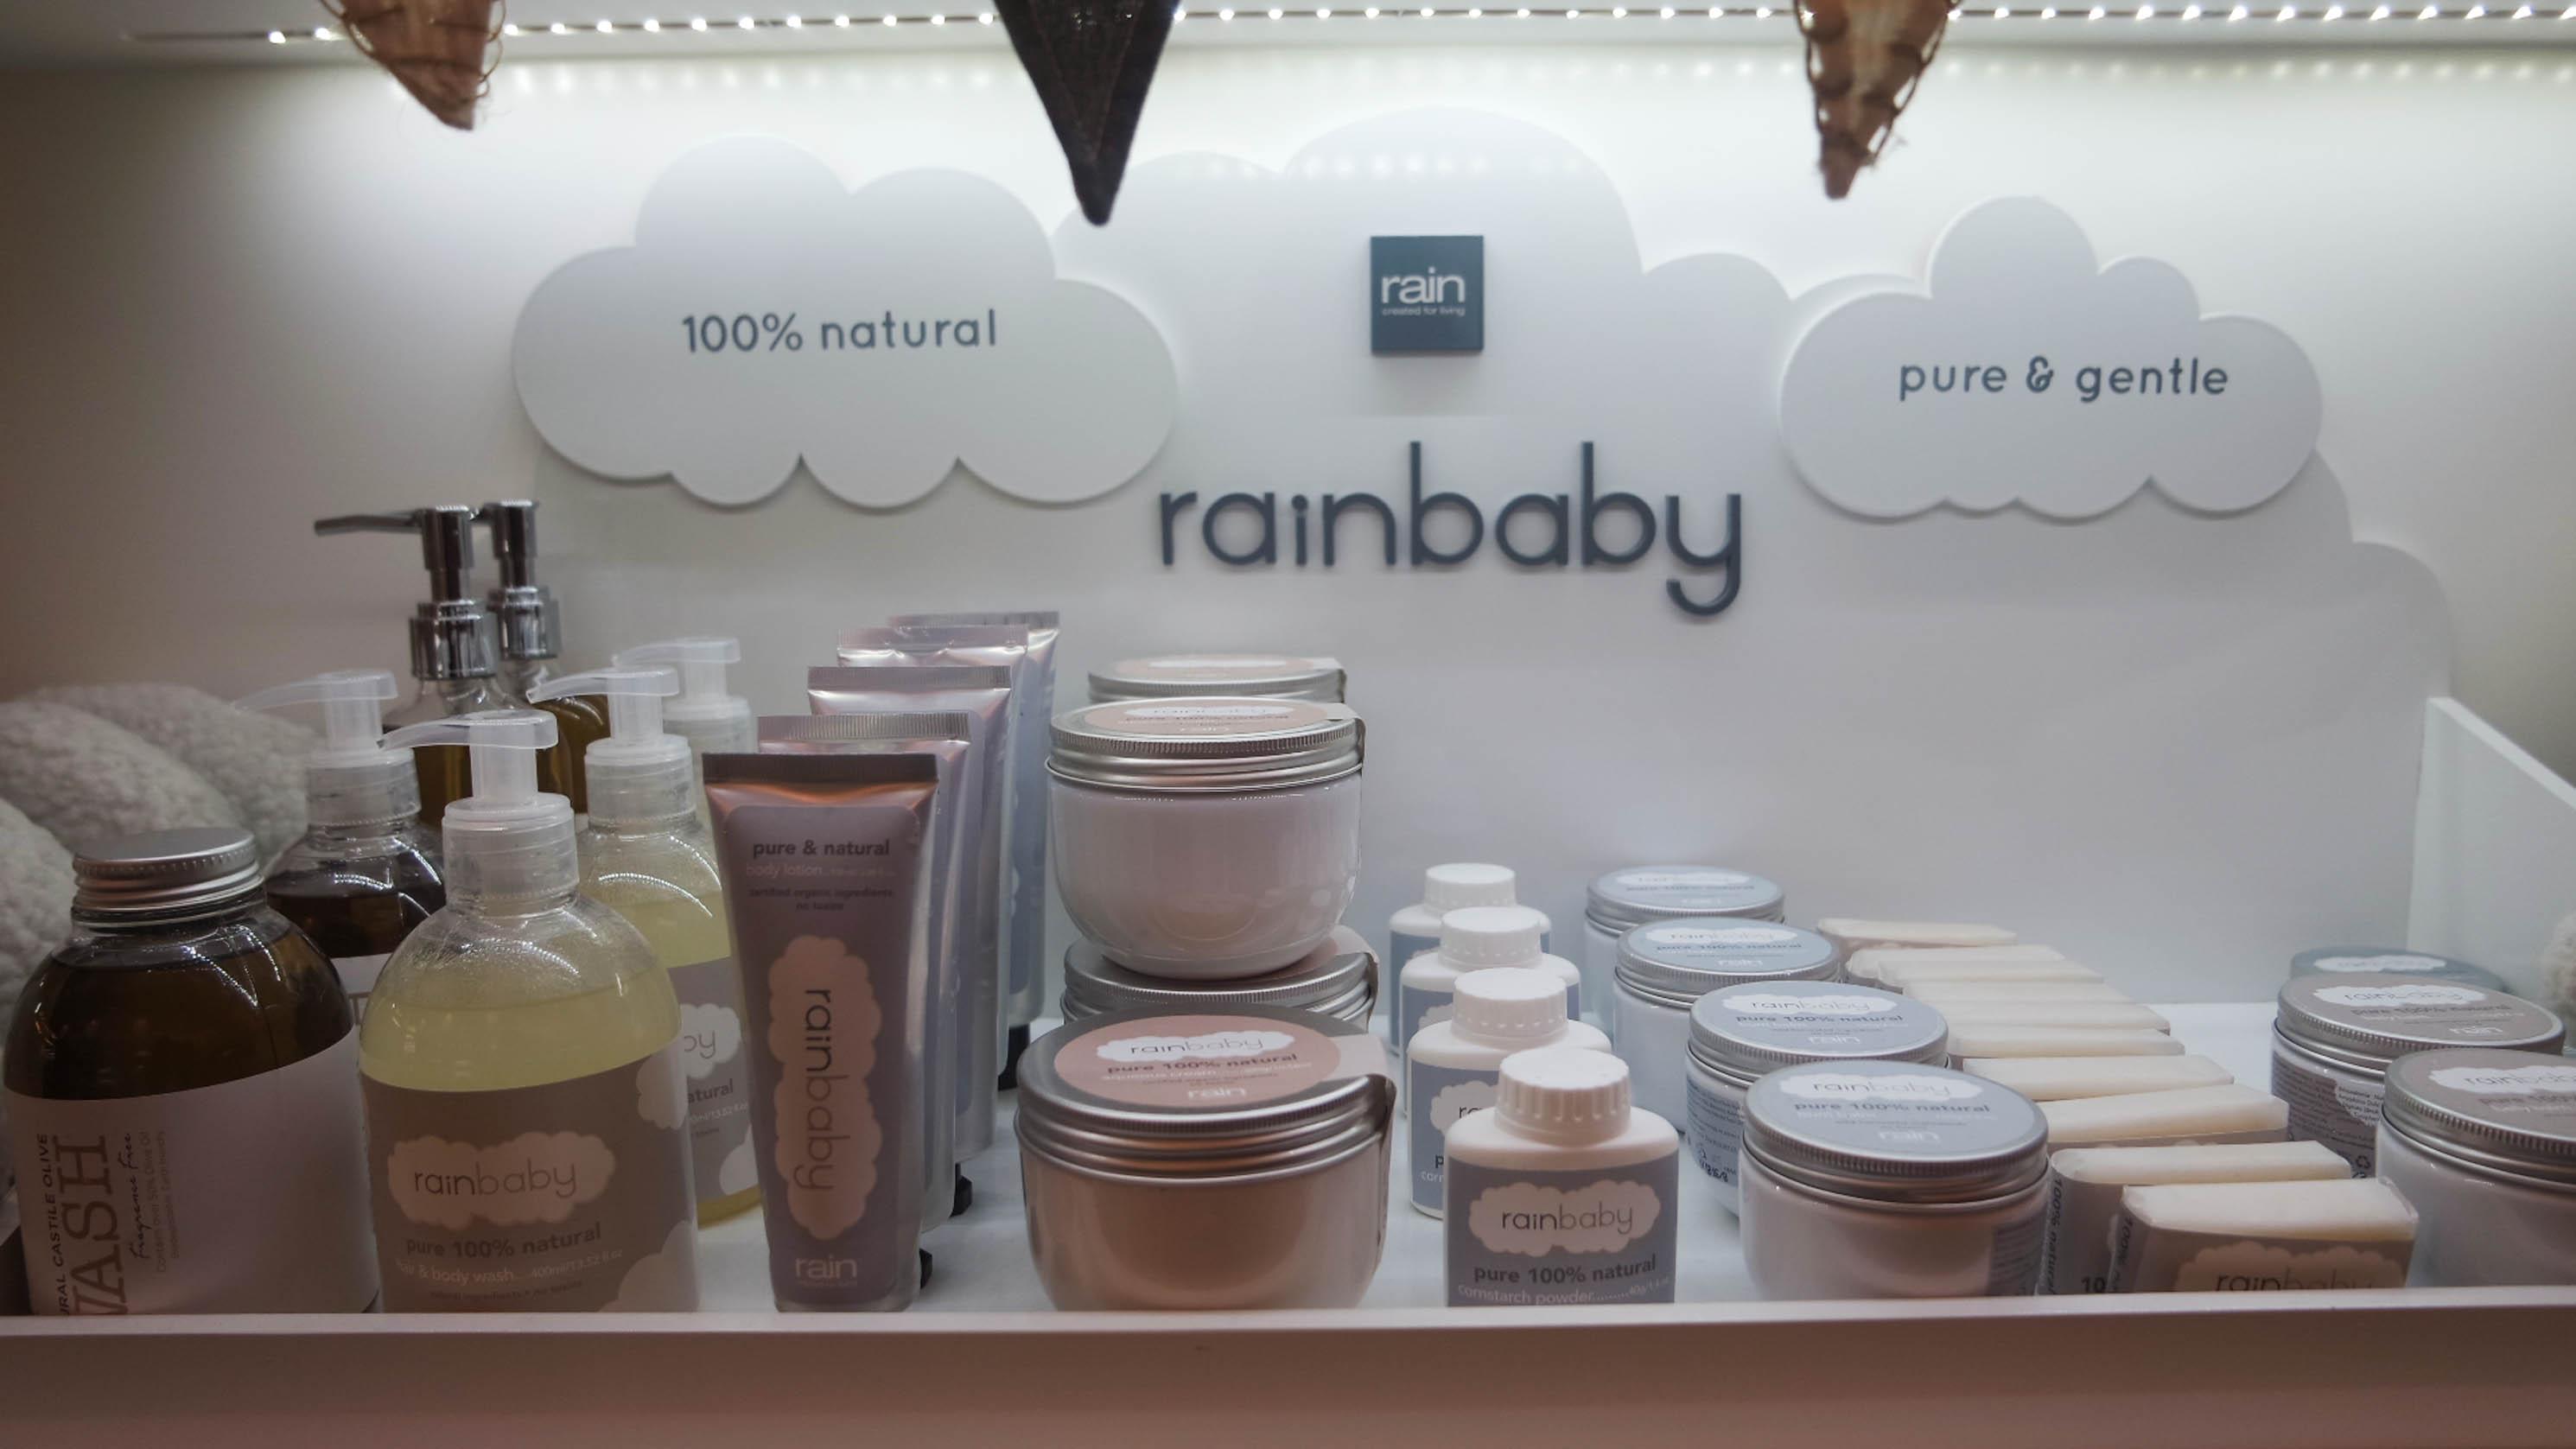 Rain baby products